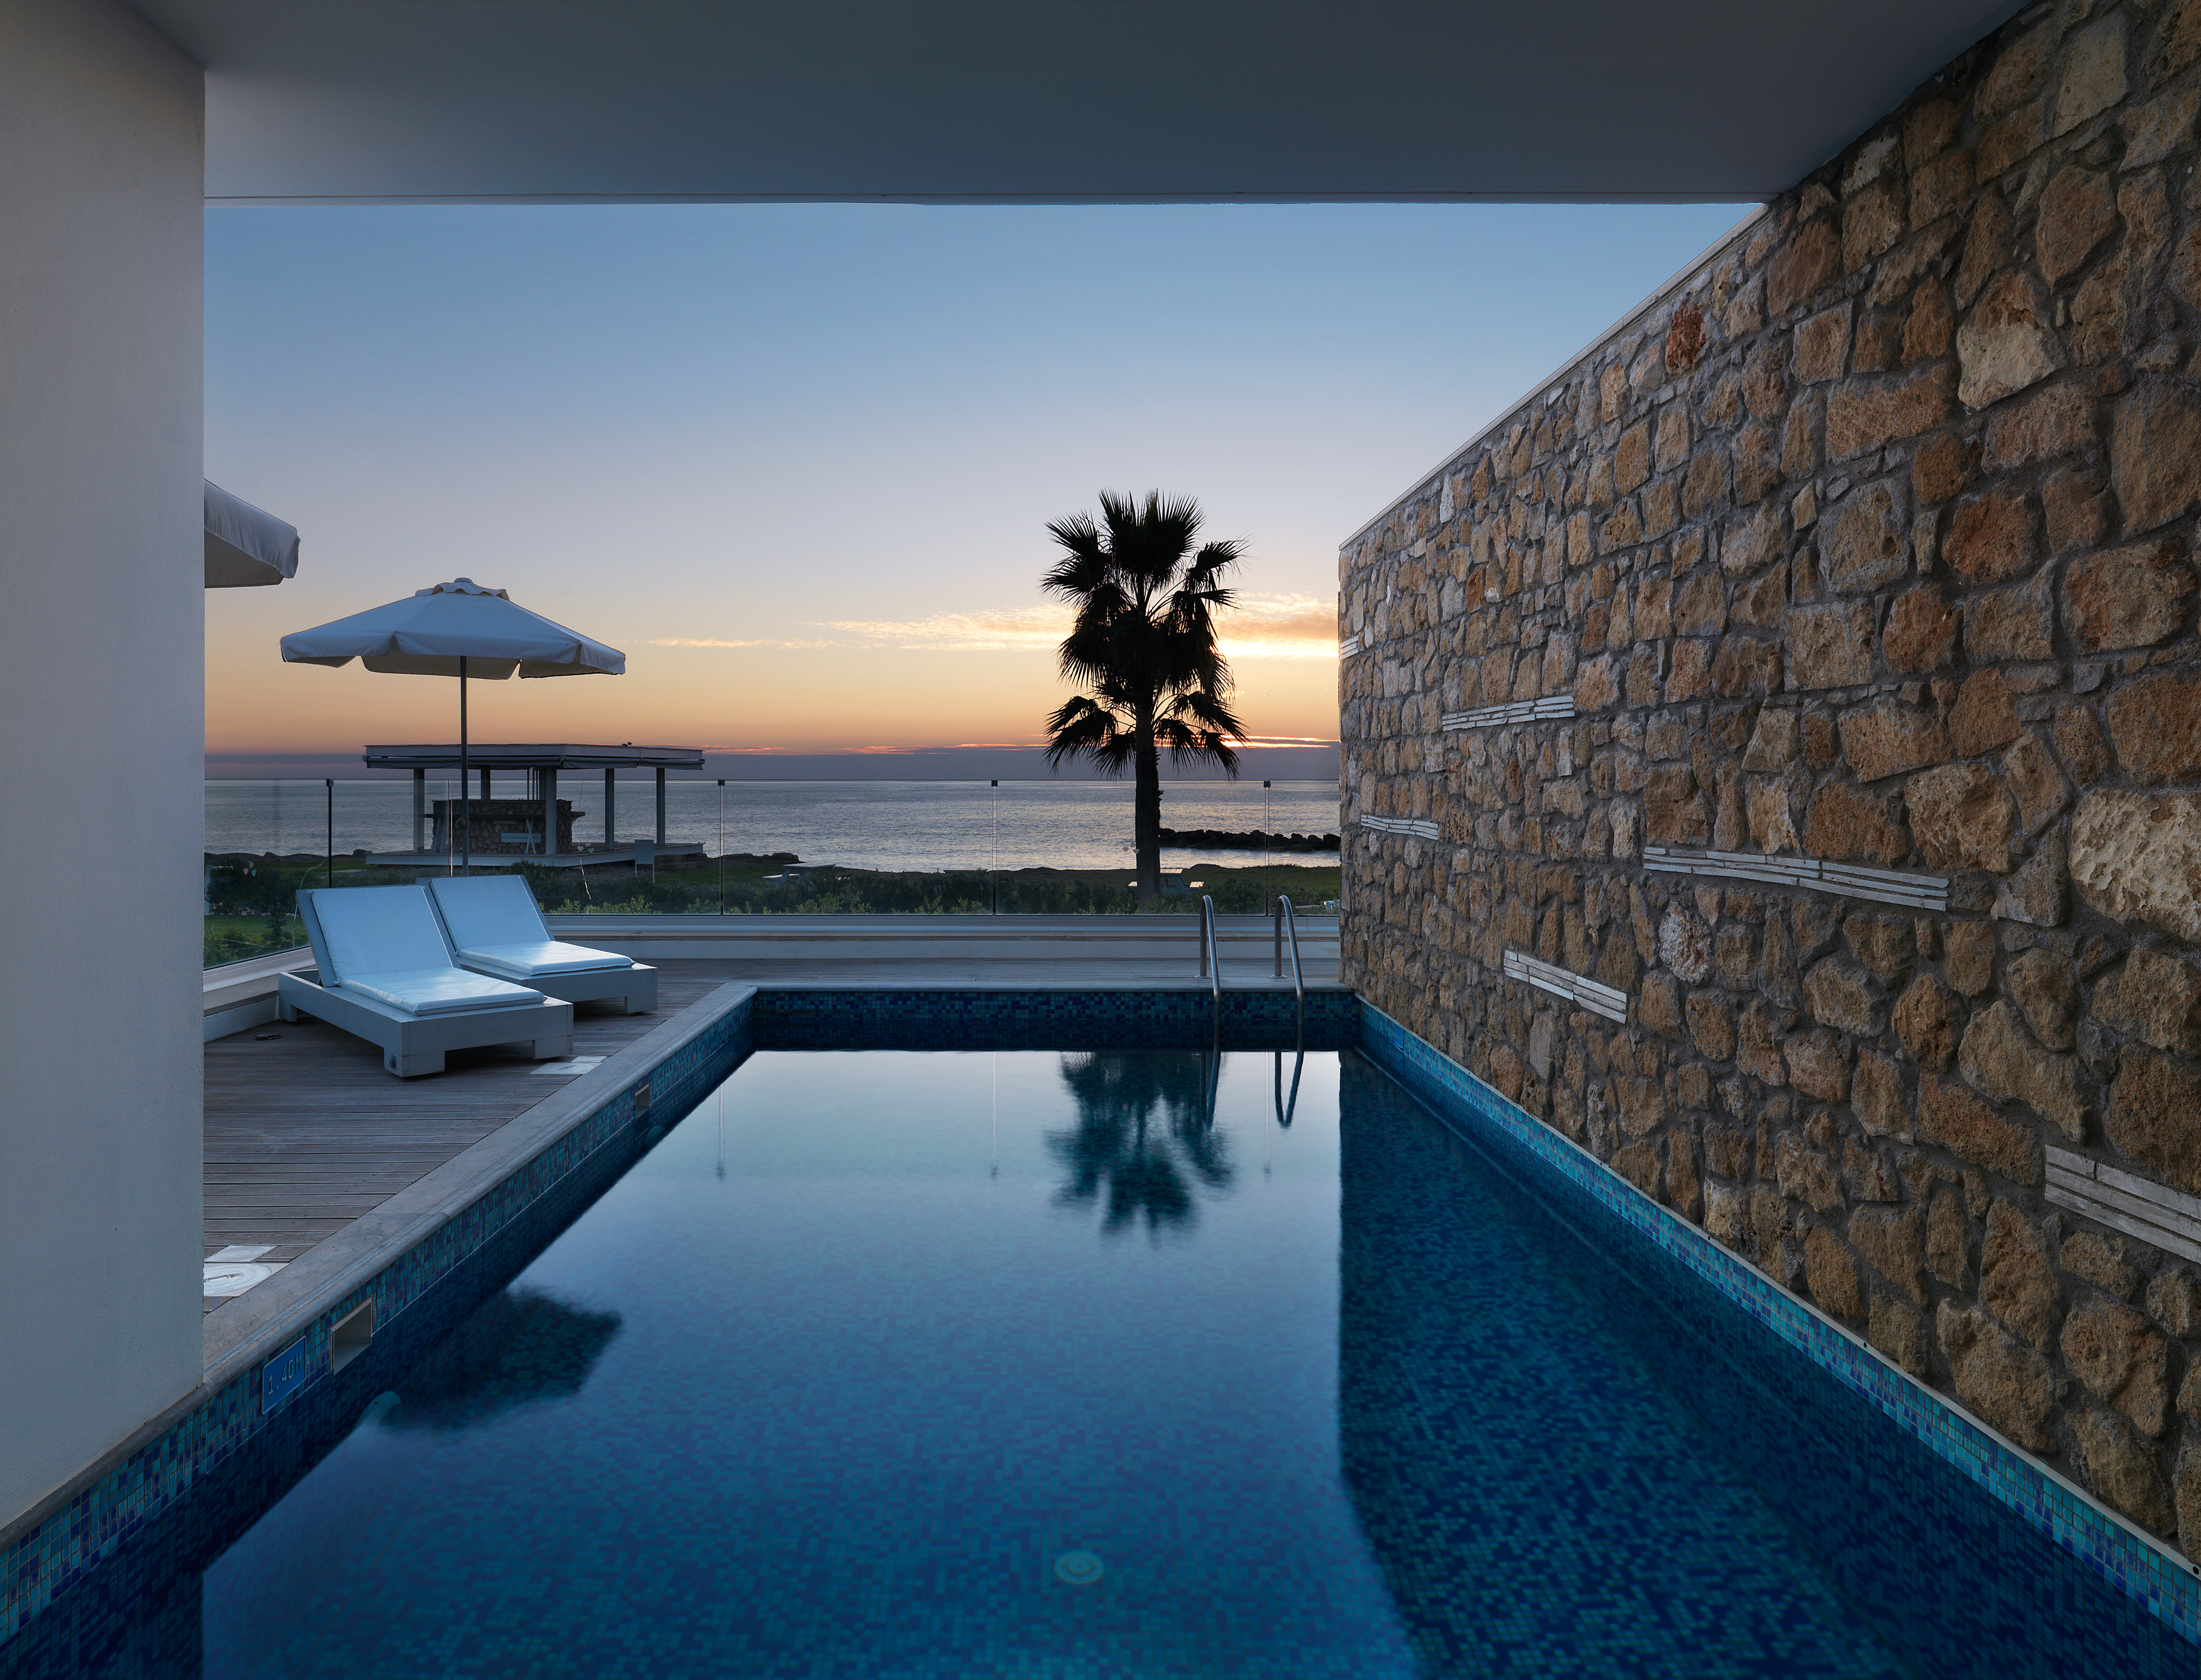 Paradise cove beach holiday villas